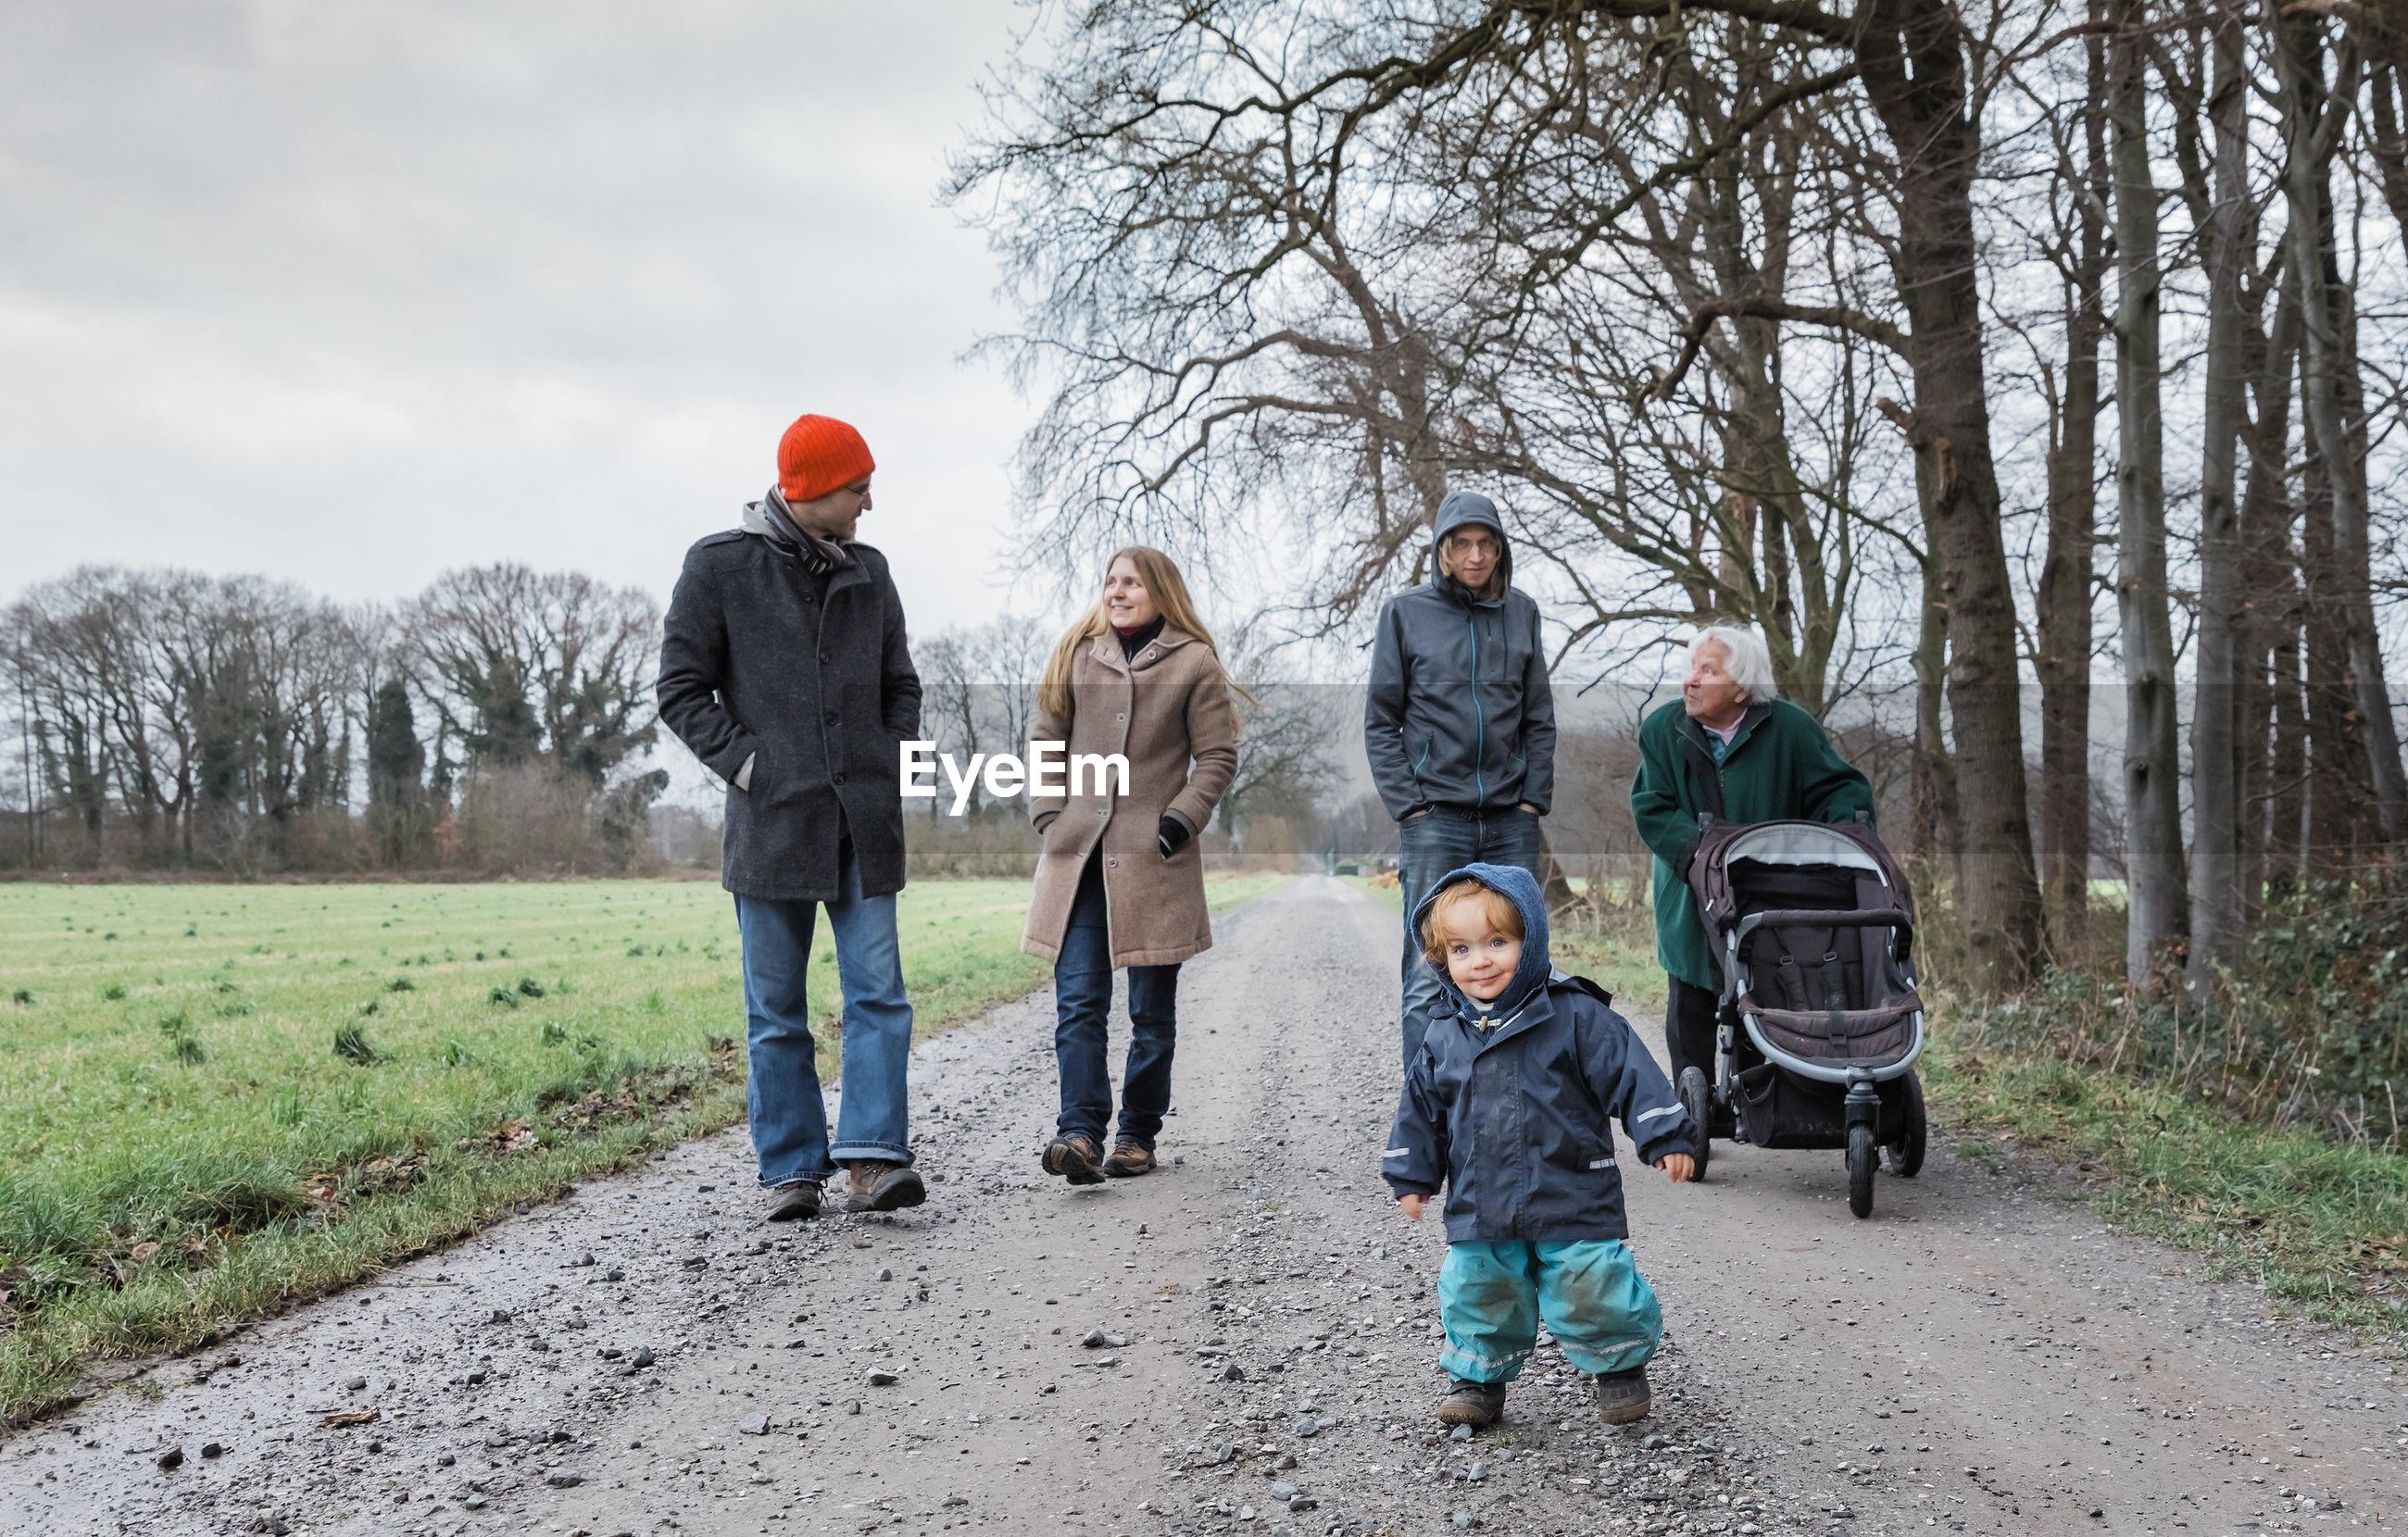 Full length of family walking on road during winter